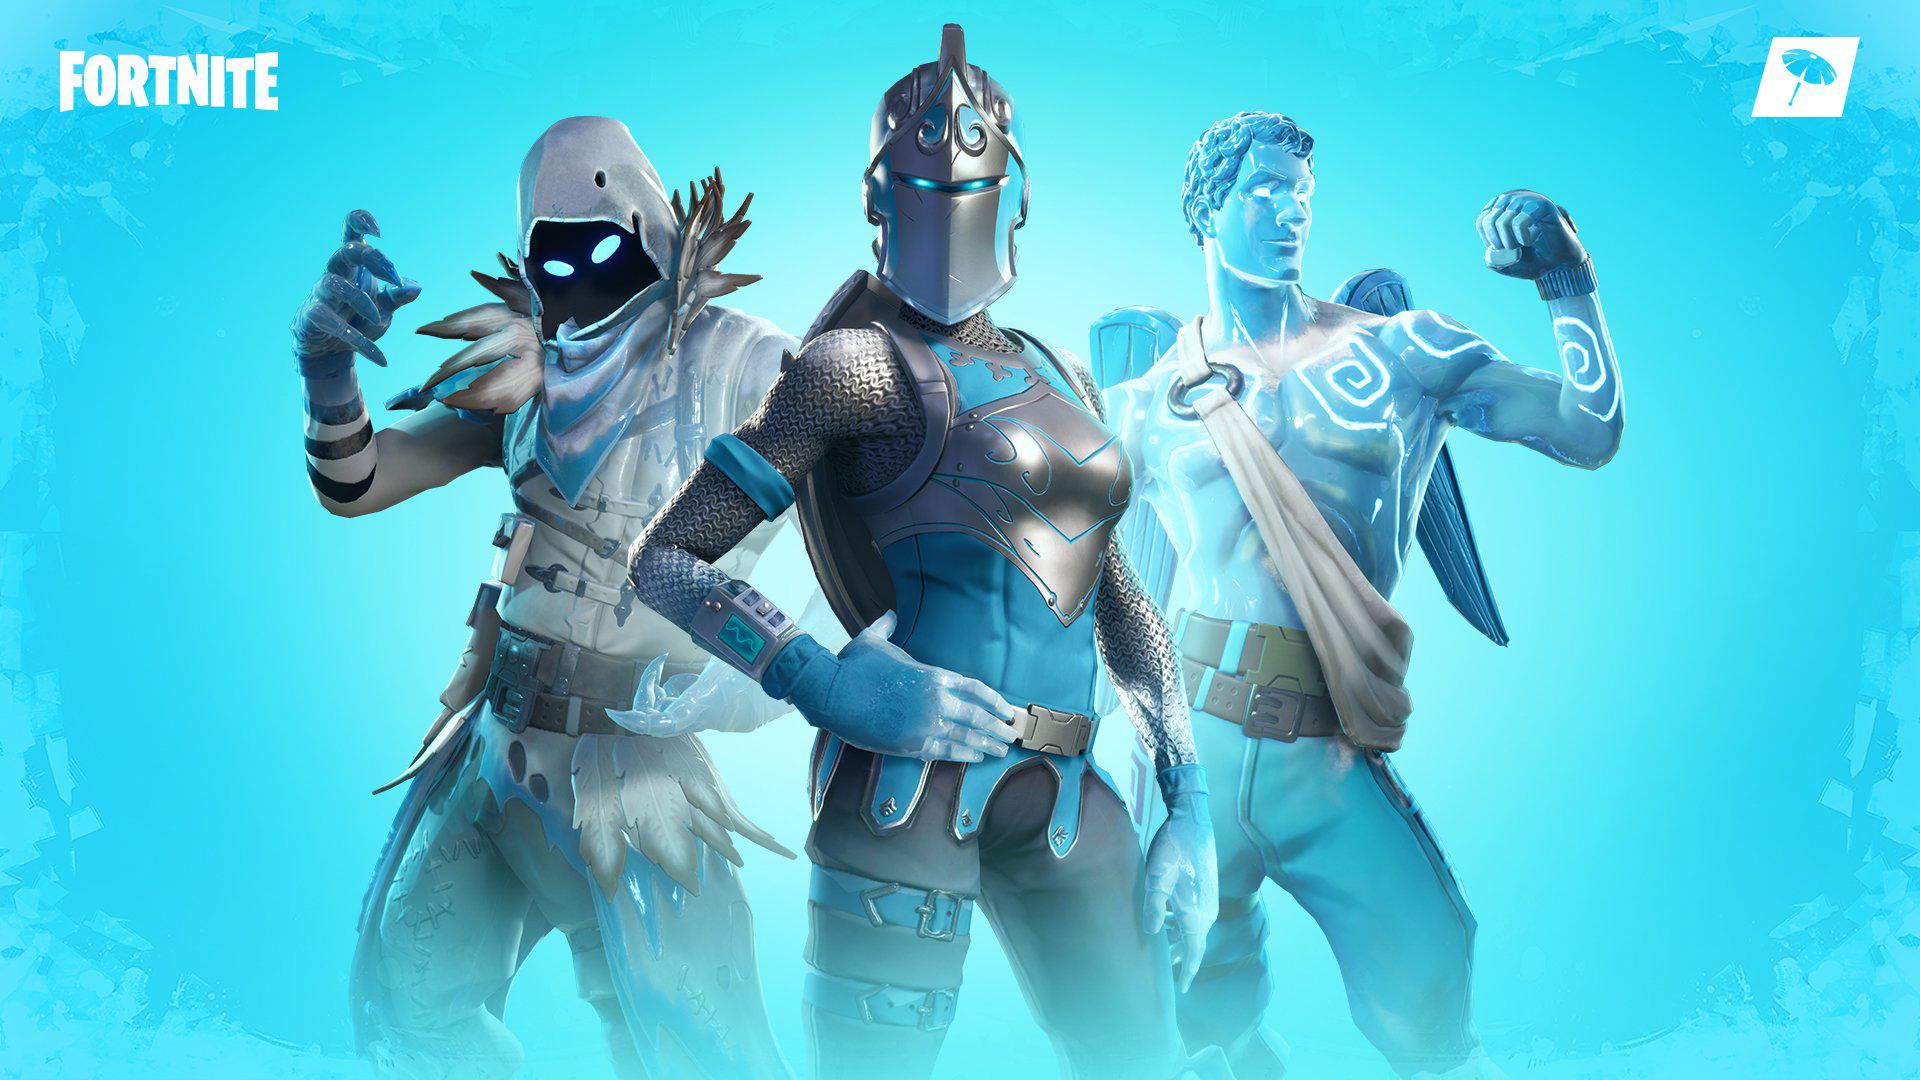 Fortnite Wallpaper Frozen Legends Pack Set